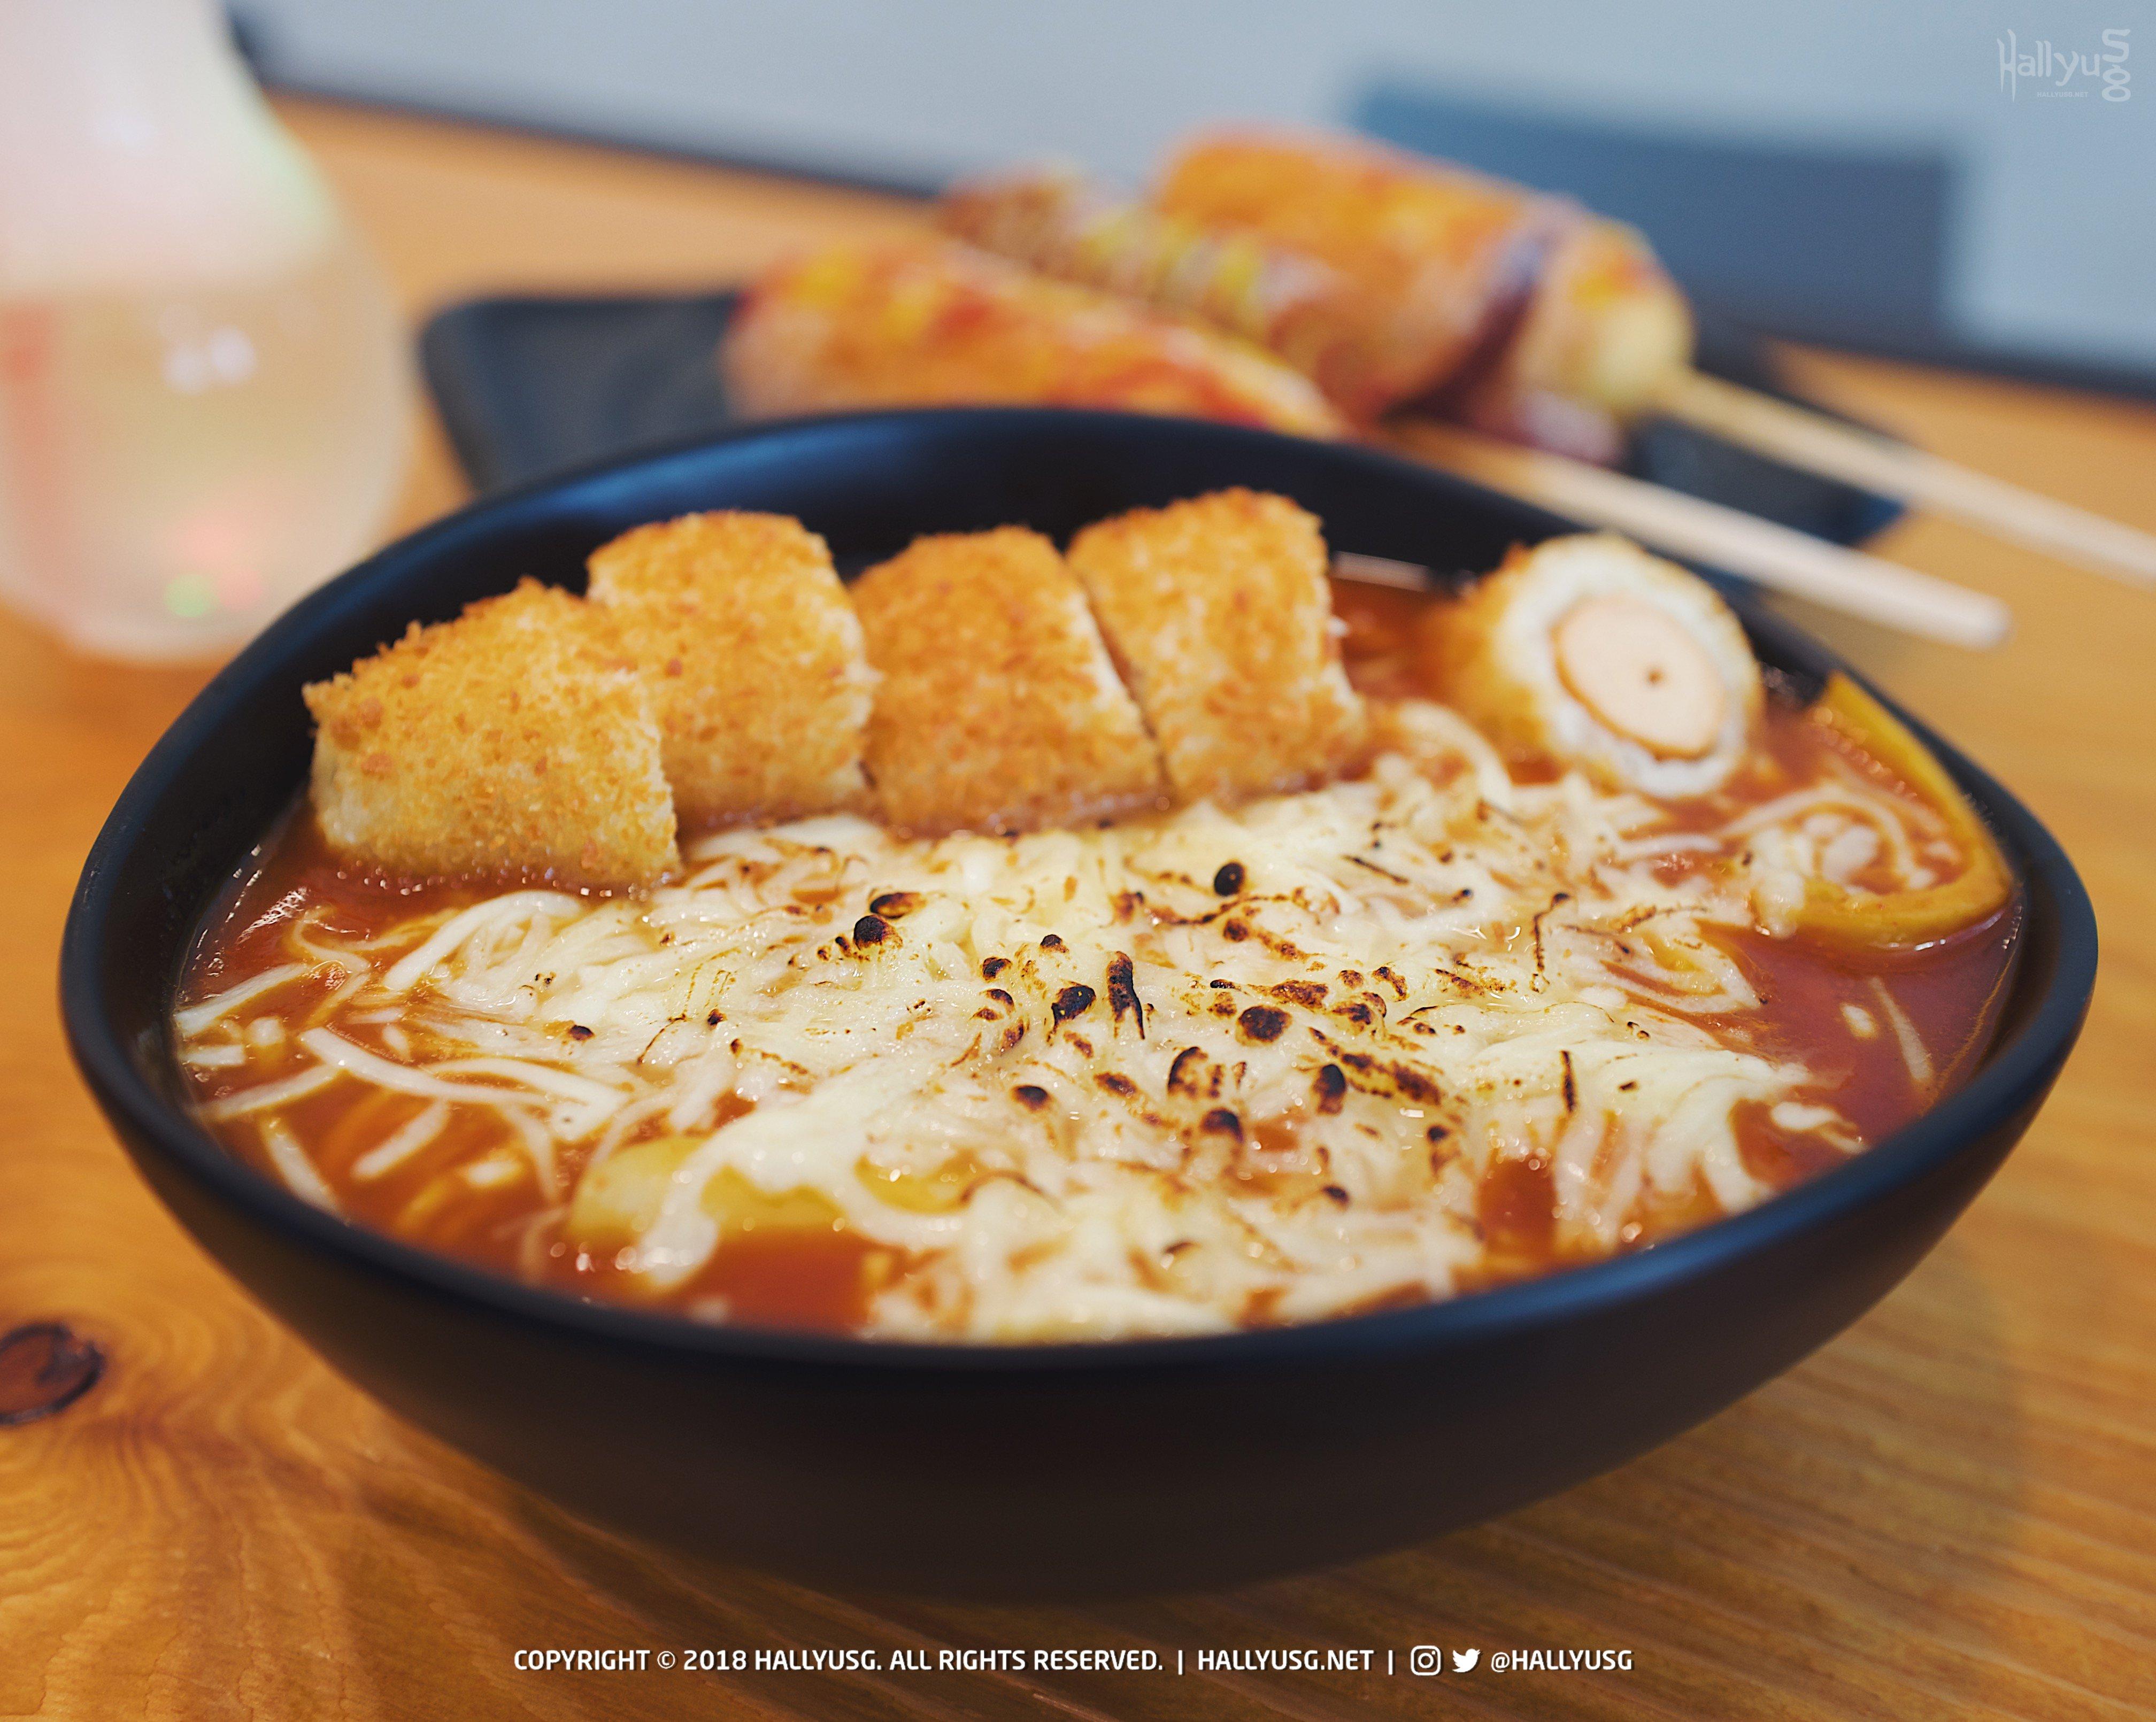 Gangnam Corndog Authentic Korean Street Food Right Here In